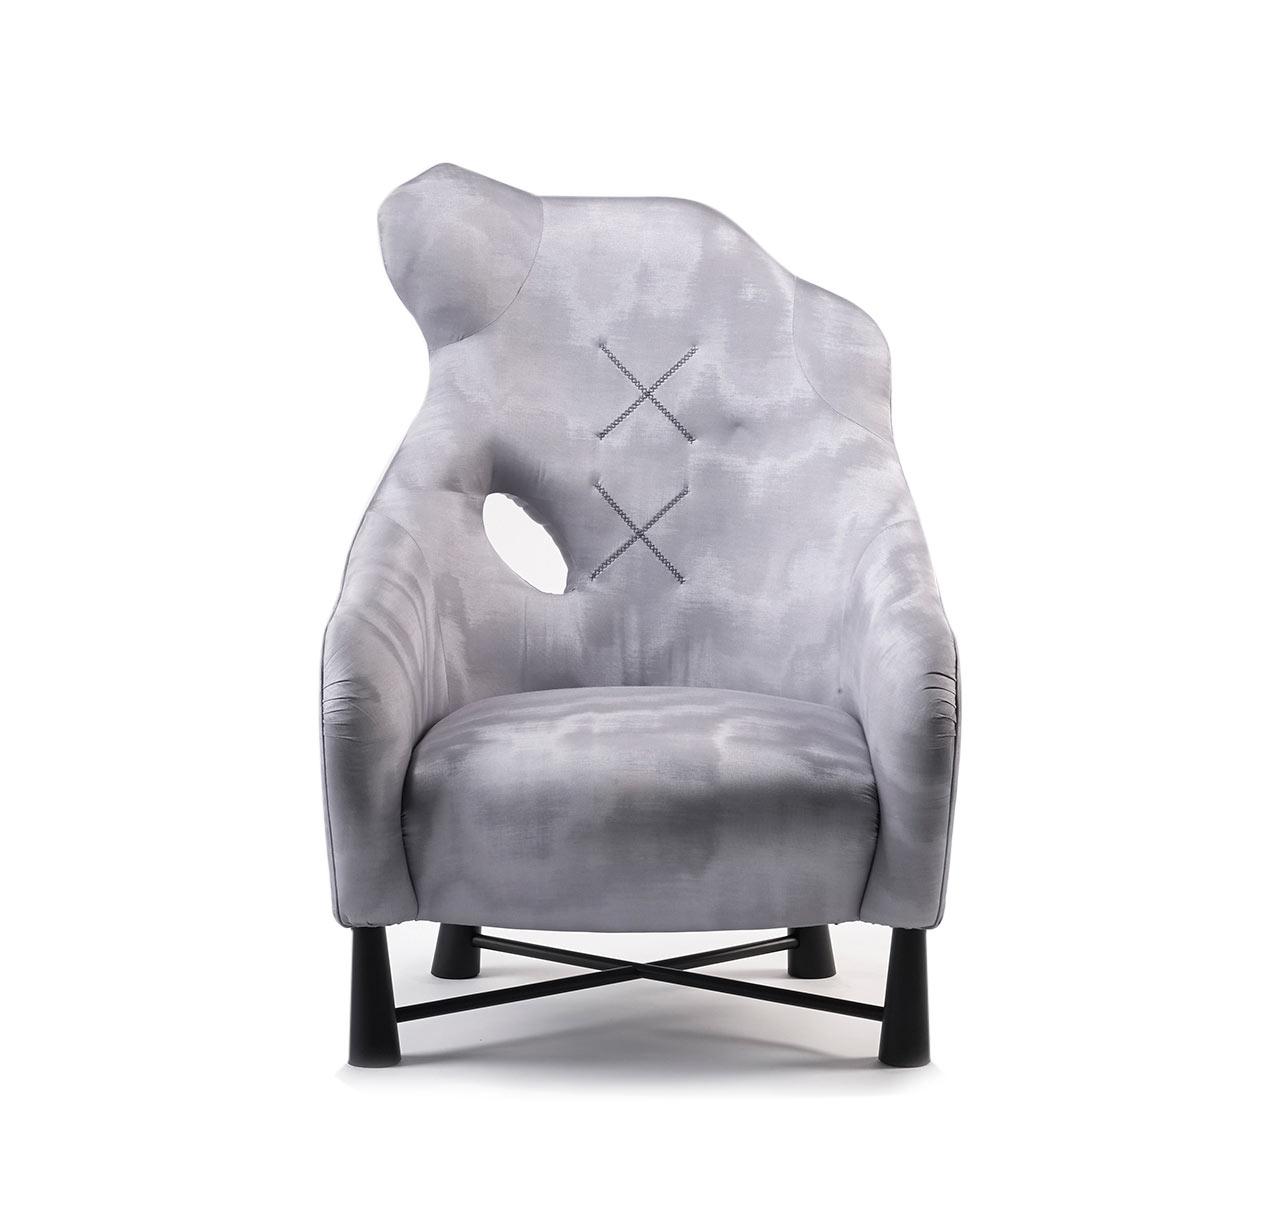 brad-ascalon-dedar-deevolution-chair-4